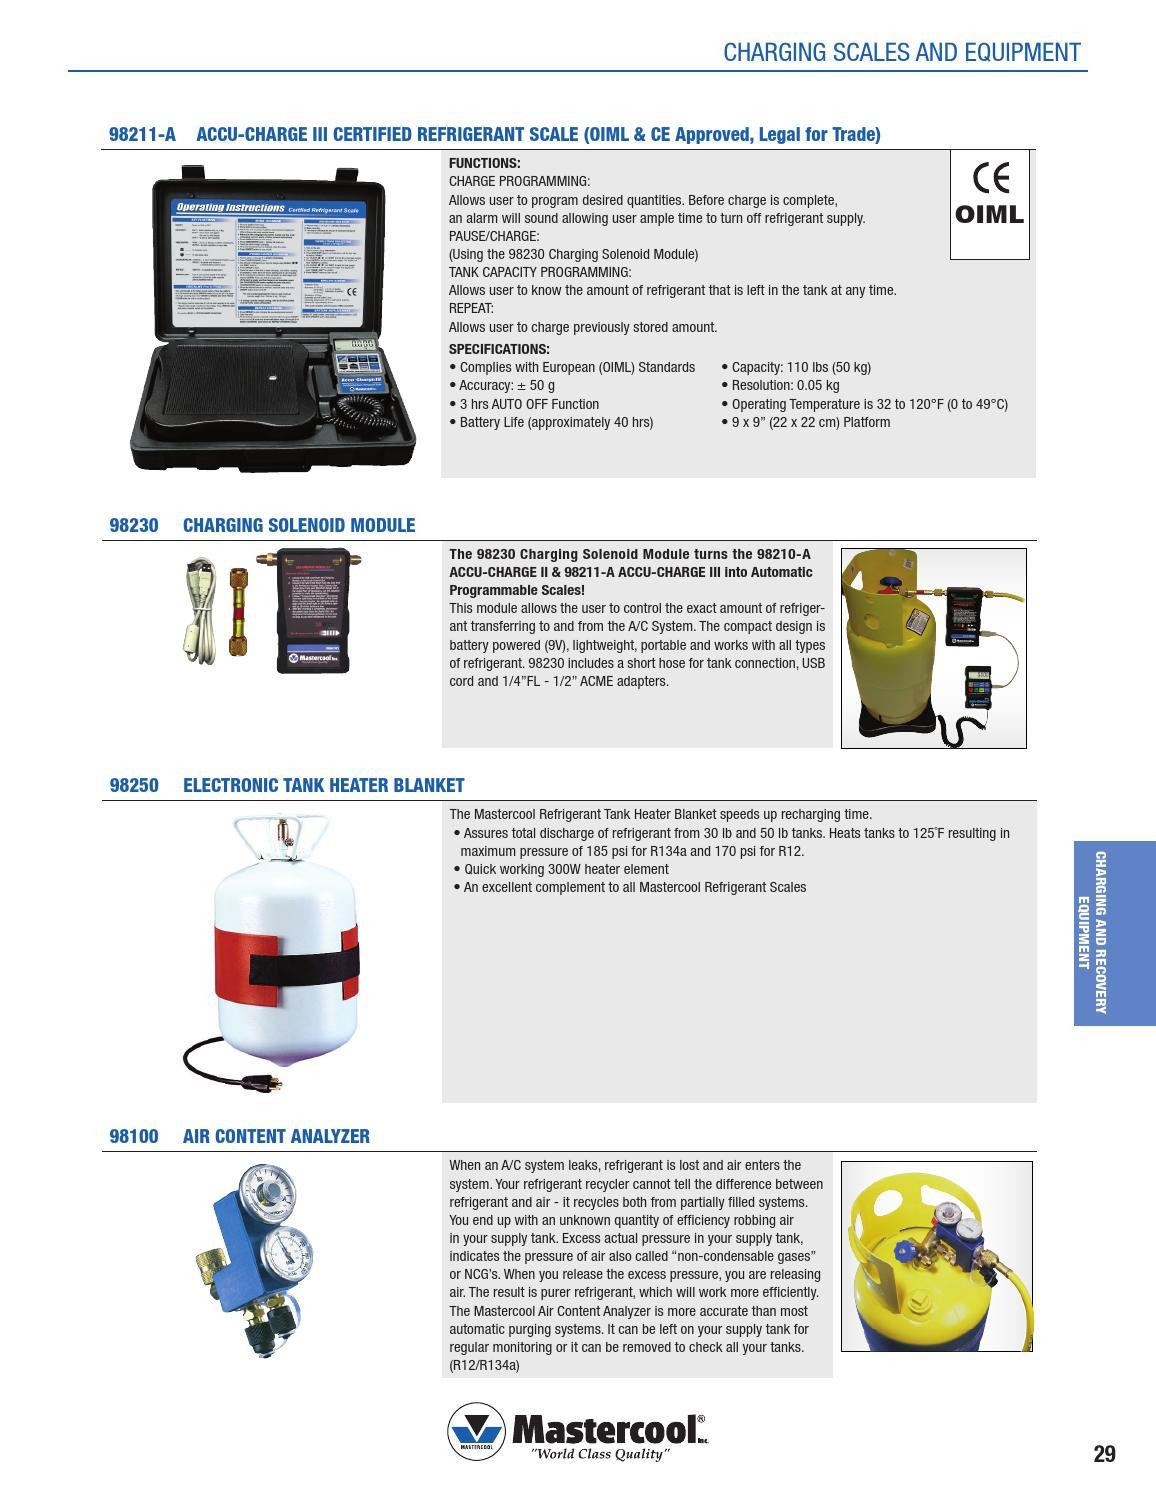 Mastercool Automotive Catalog 2015 by Mastercool Inc  - issuu